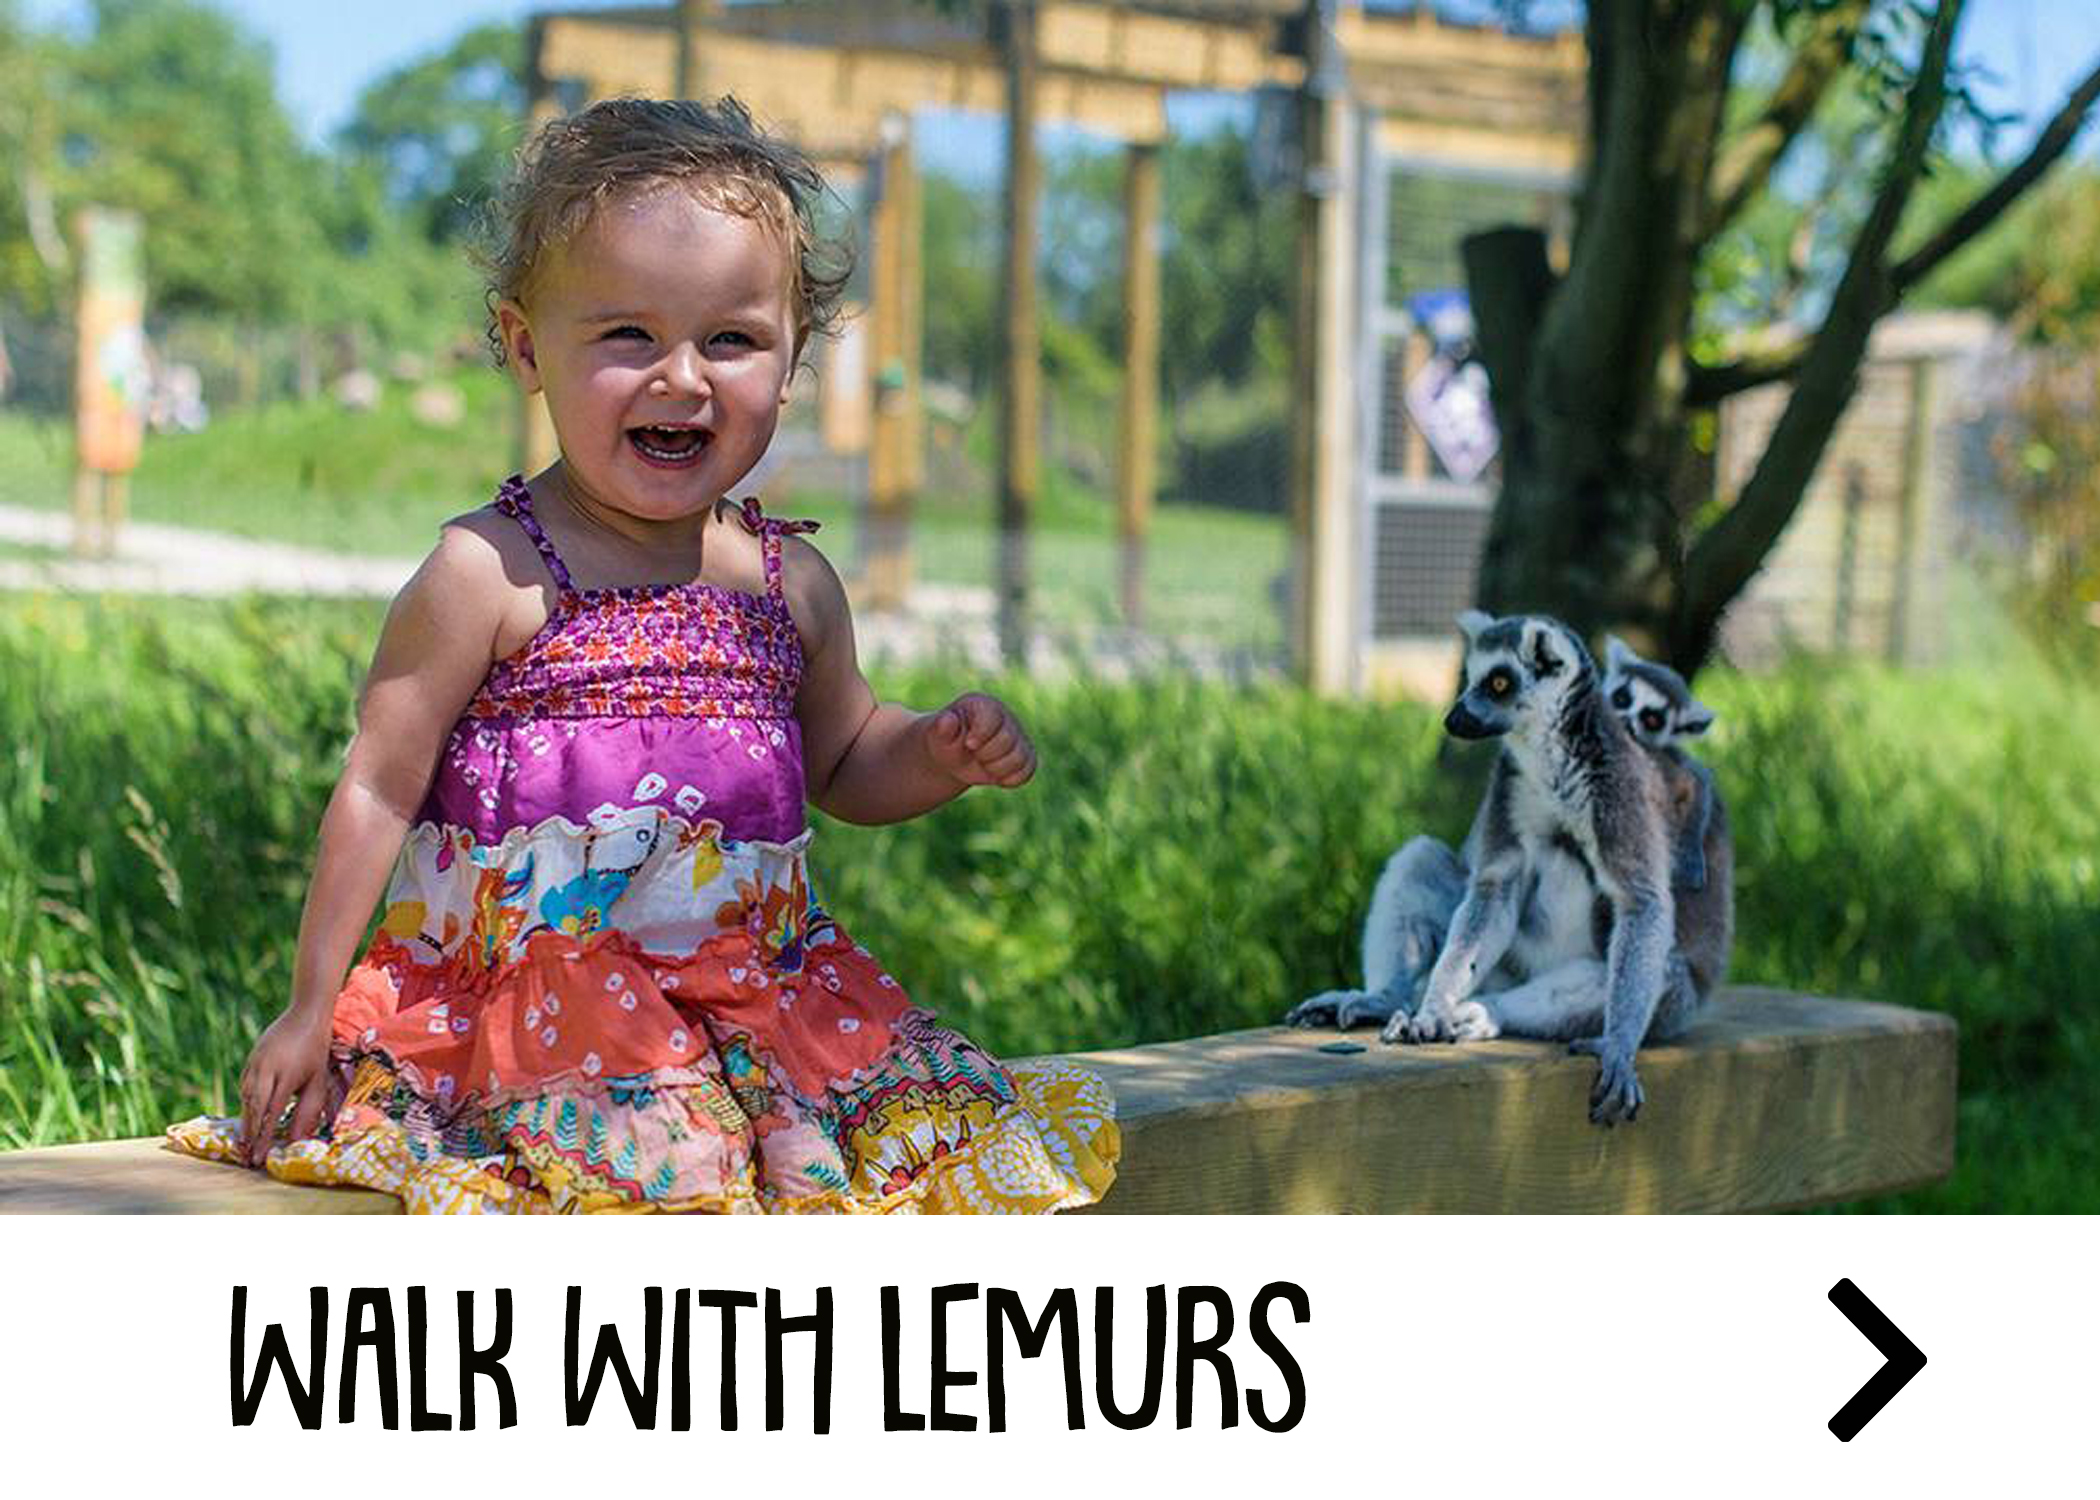 Walk with lemurs